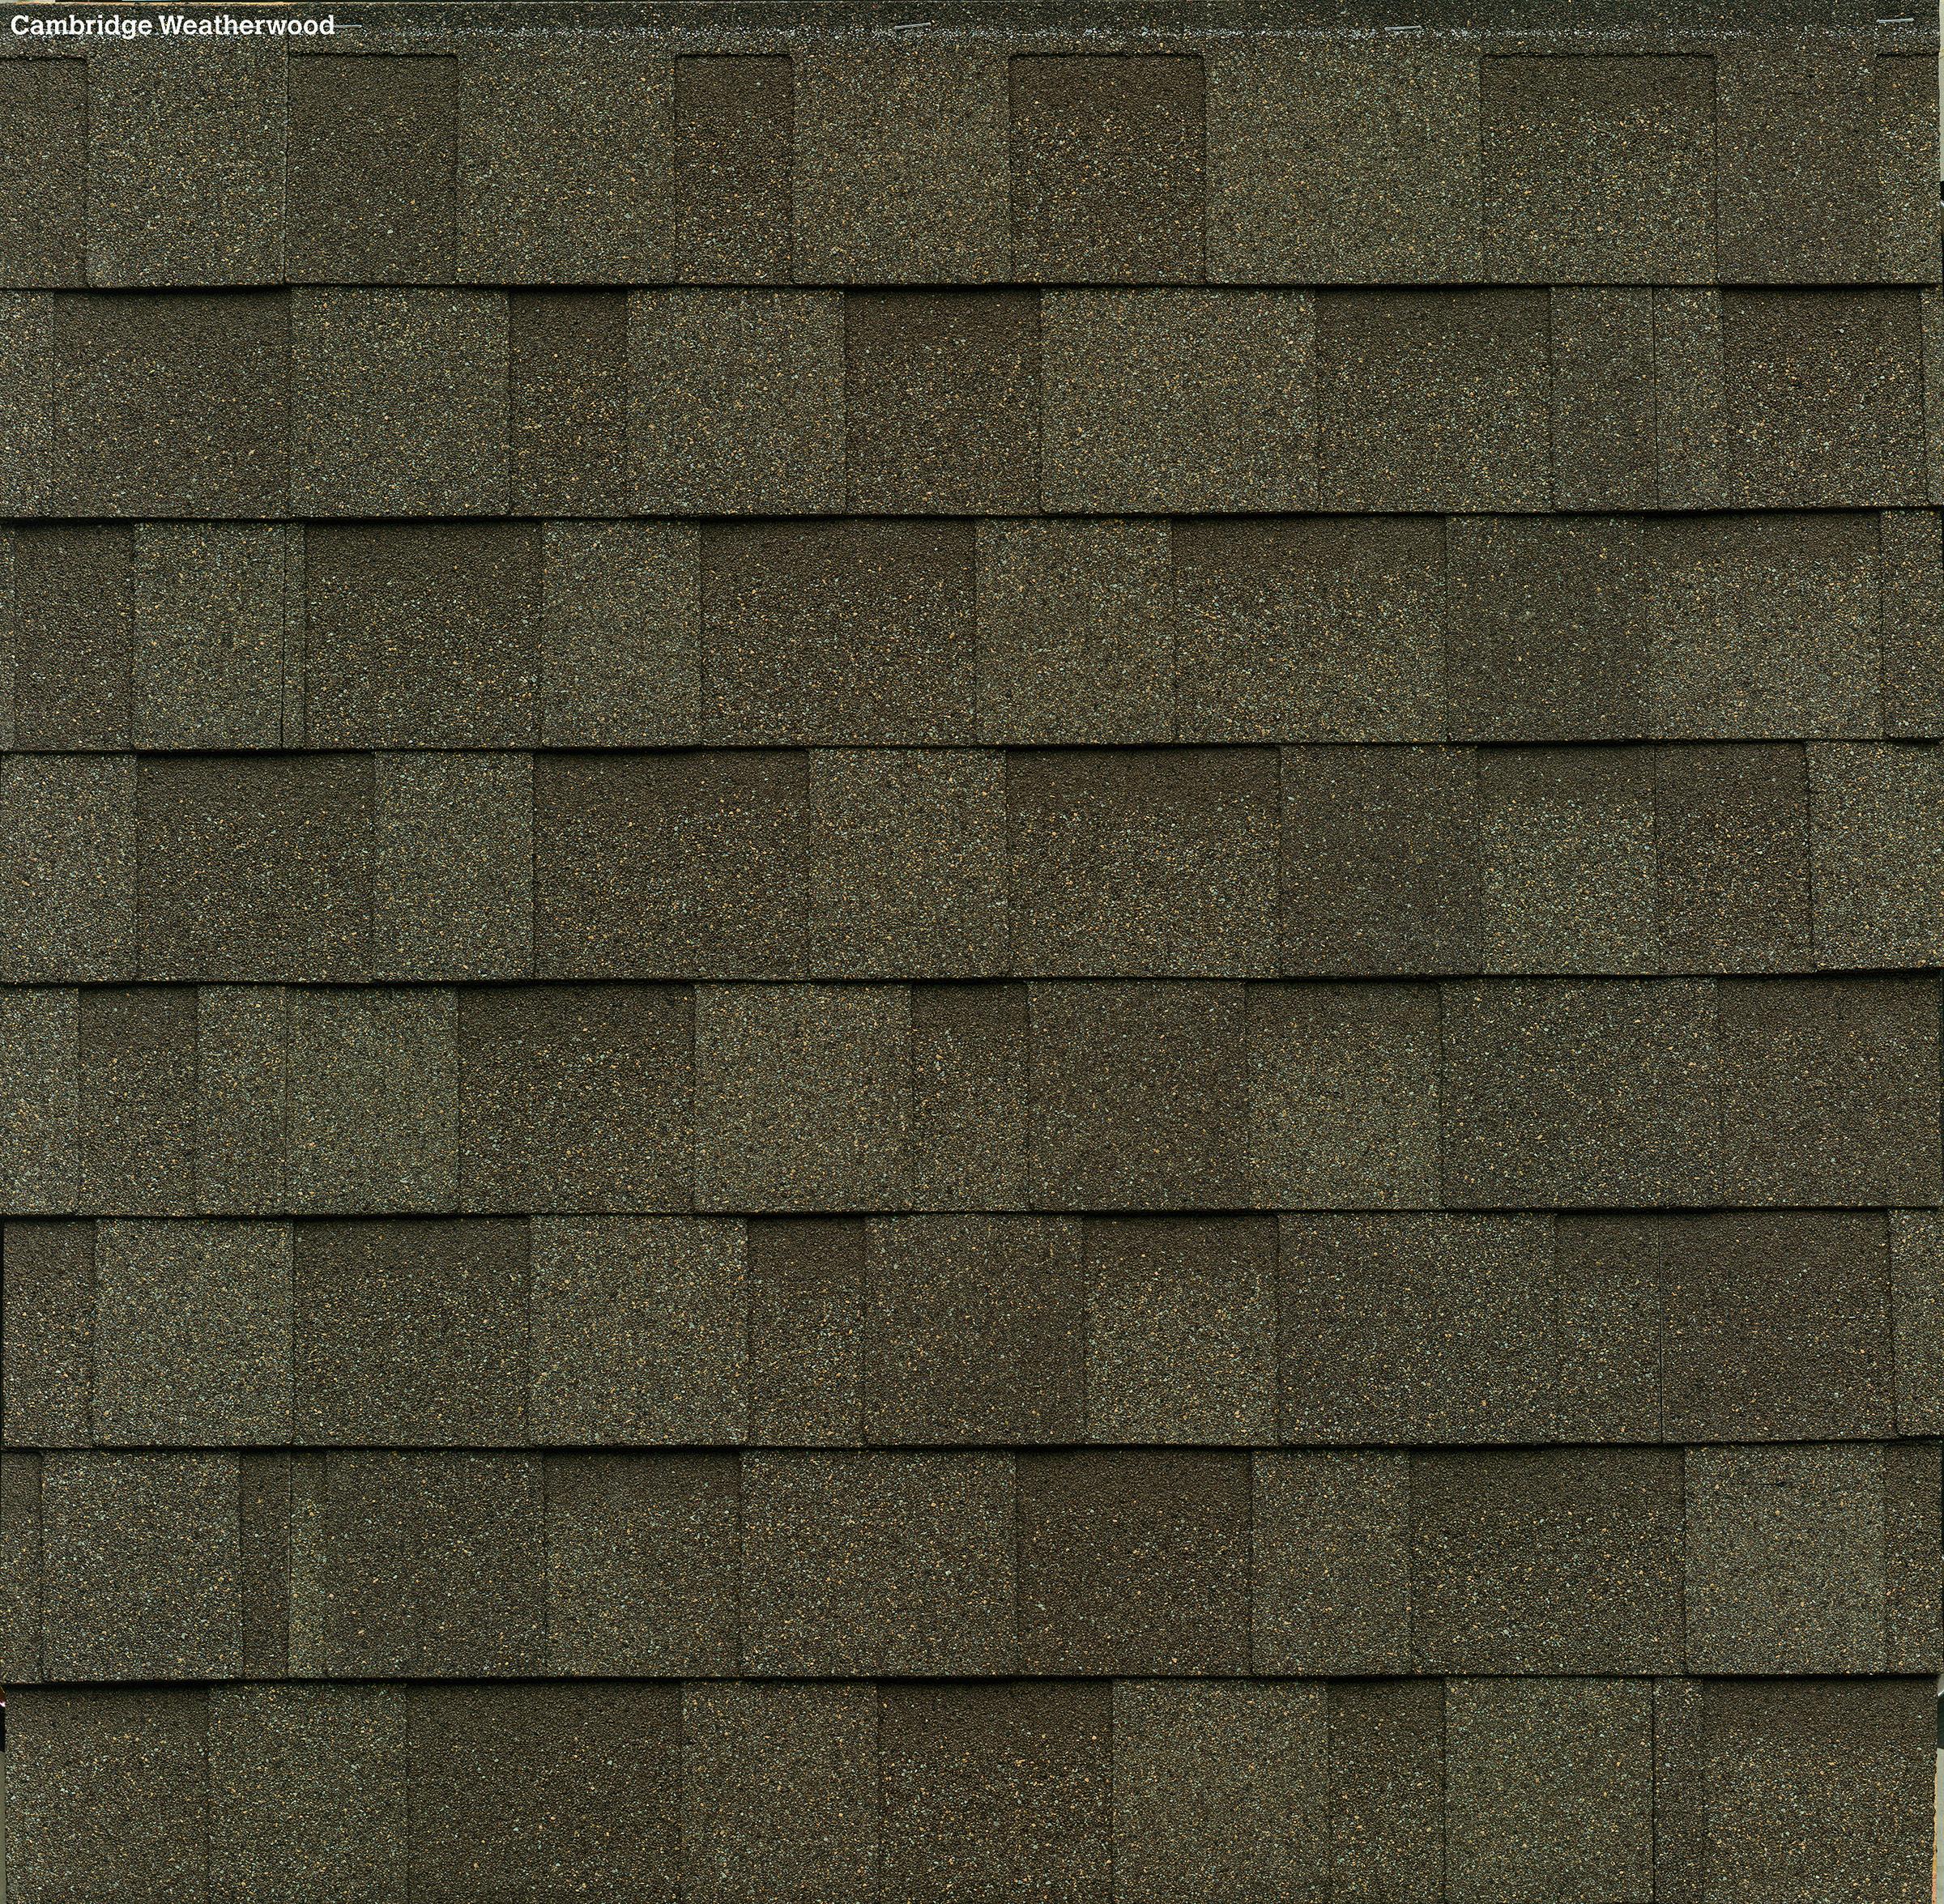 Iko Cambridge Weatherwood Swatch In 2020 Shingling Residential Roofing Shingles Roof Shingles